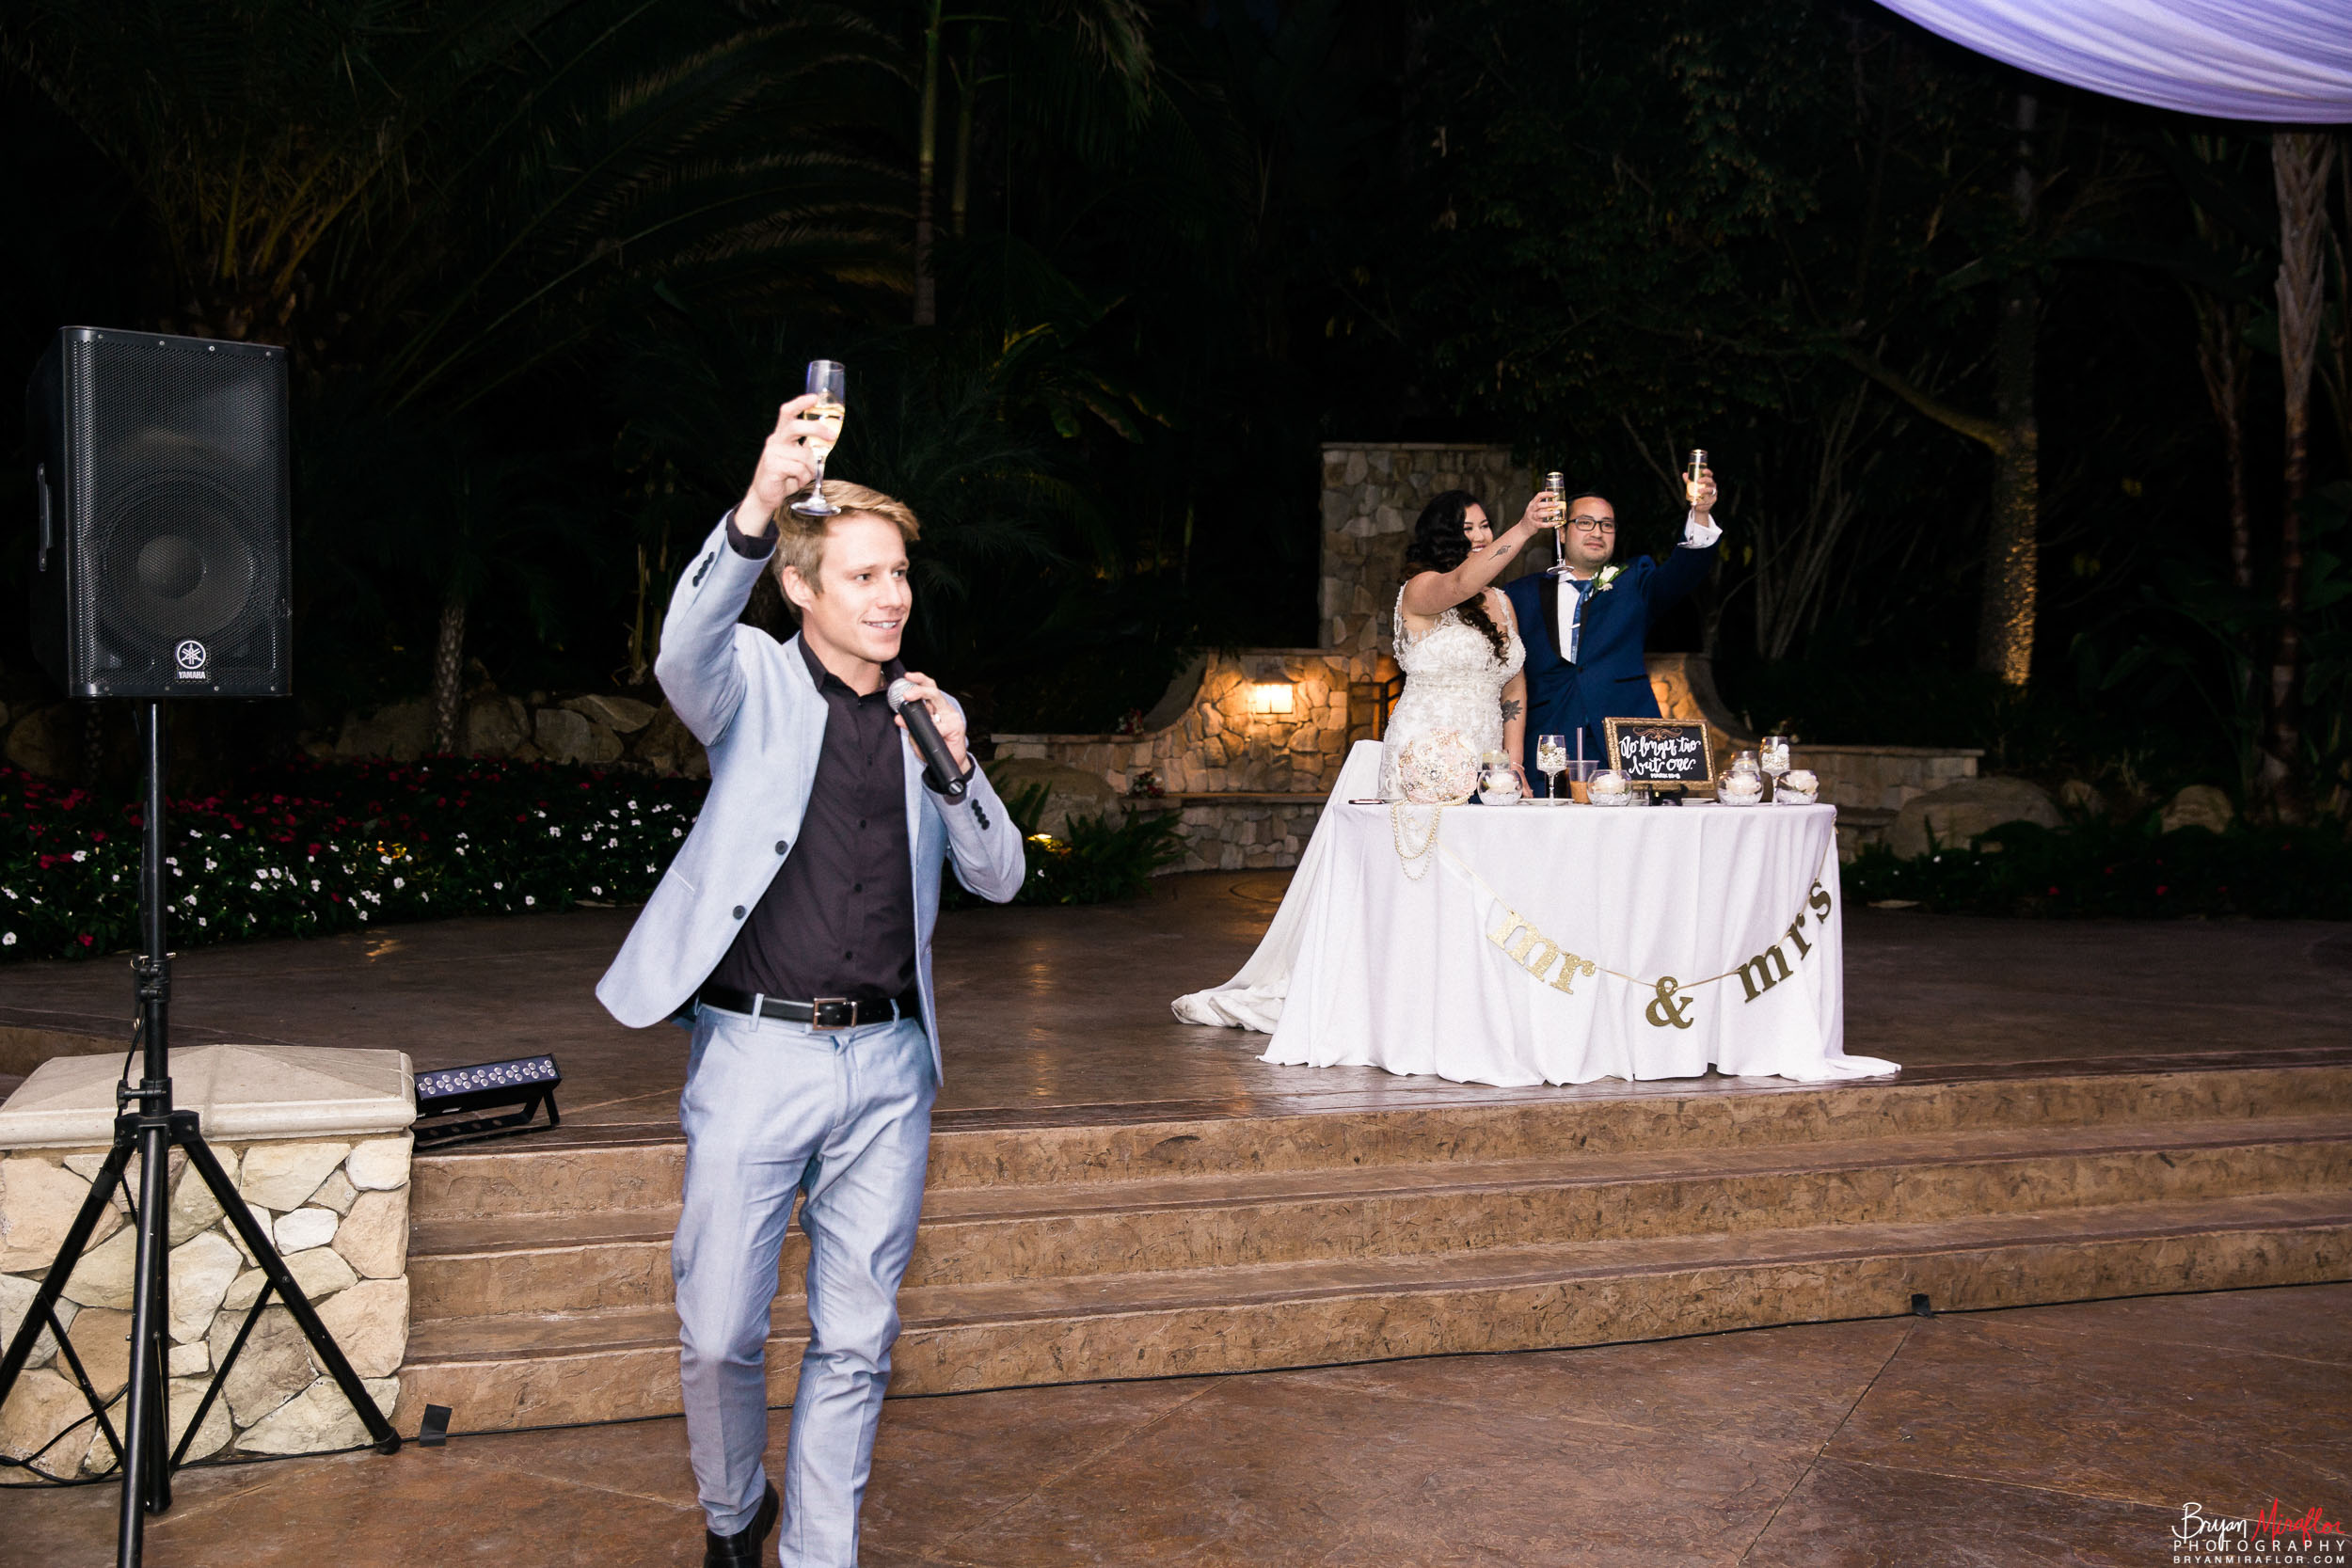 Bryan-Miraflor-Photography-Hannah-Jonathan-Married-Grand-Traditions-Estate-Gardens-Fallbrook-20171222-195.jpg